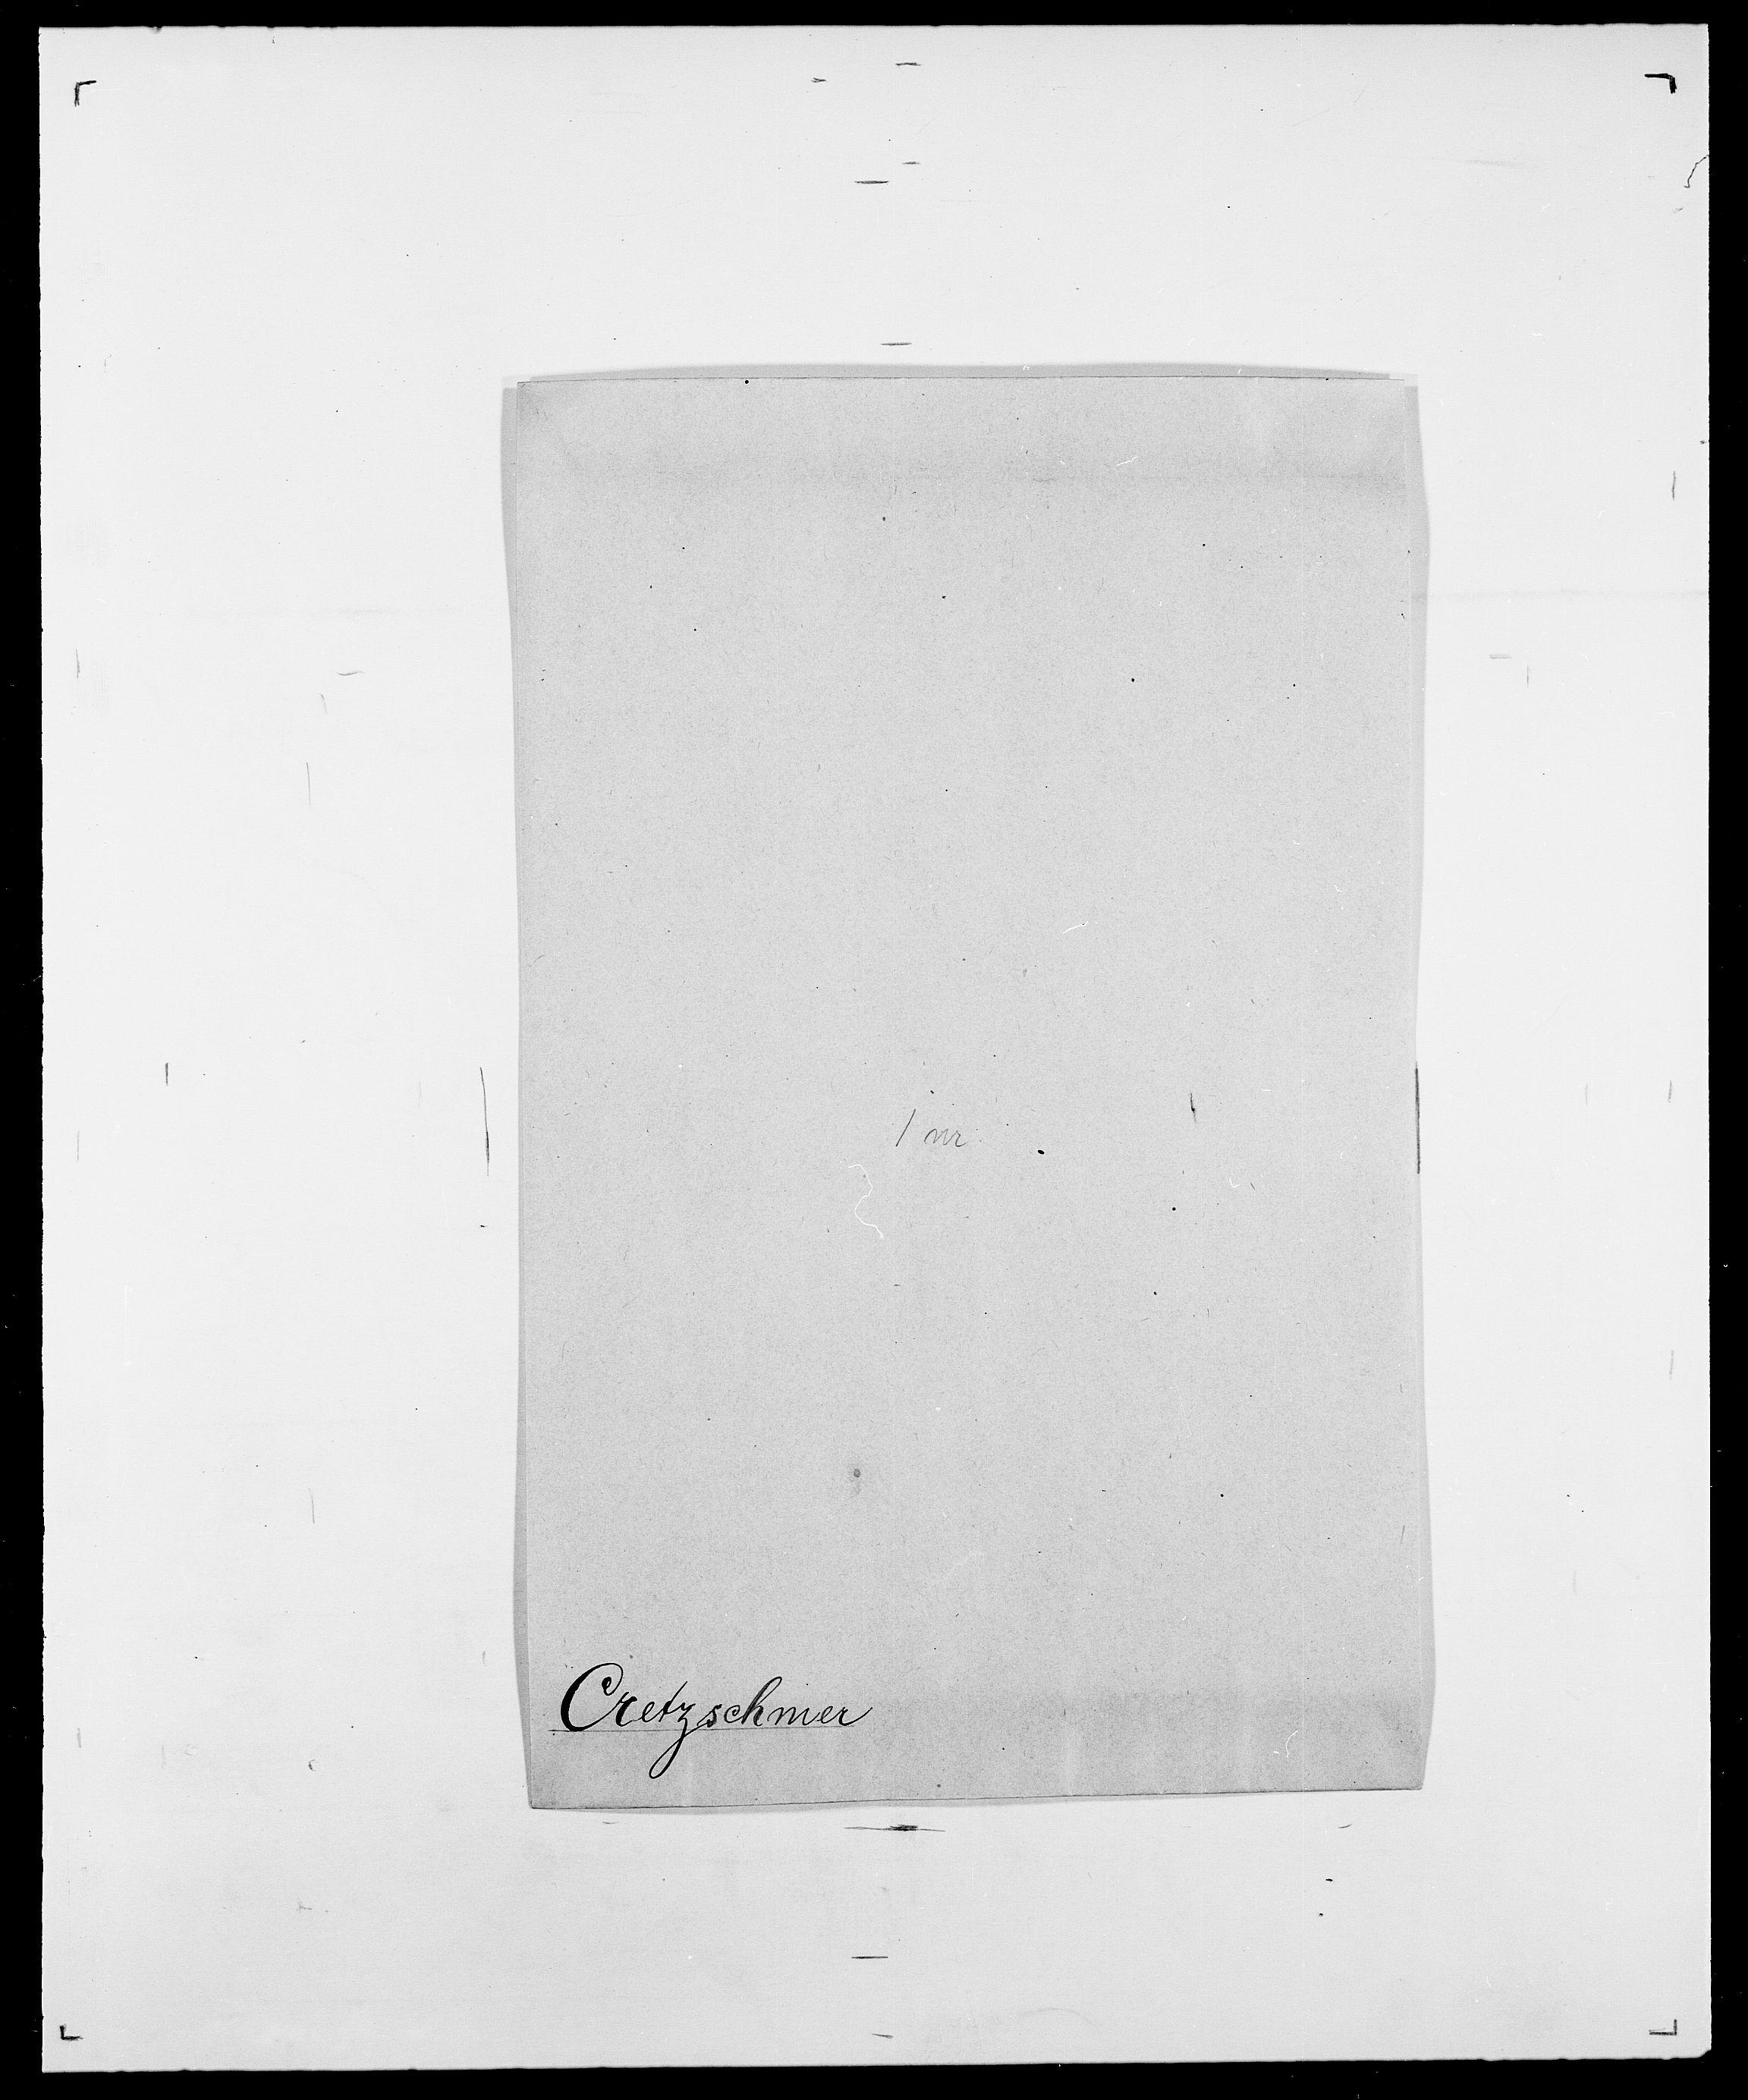 SAO, Delgobe, Charles Antoine - samling, D/Da/L0008: Capjon - Dagenbolt, s. 609